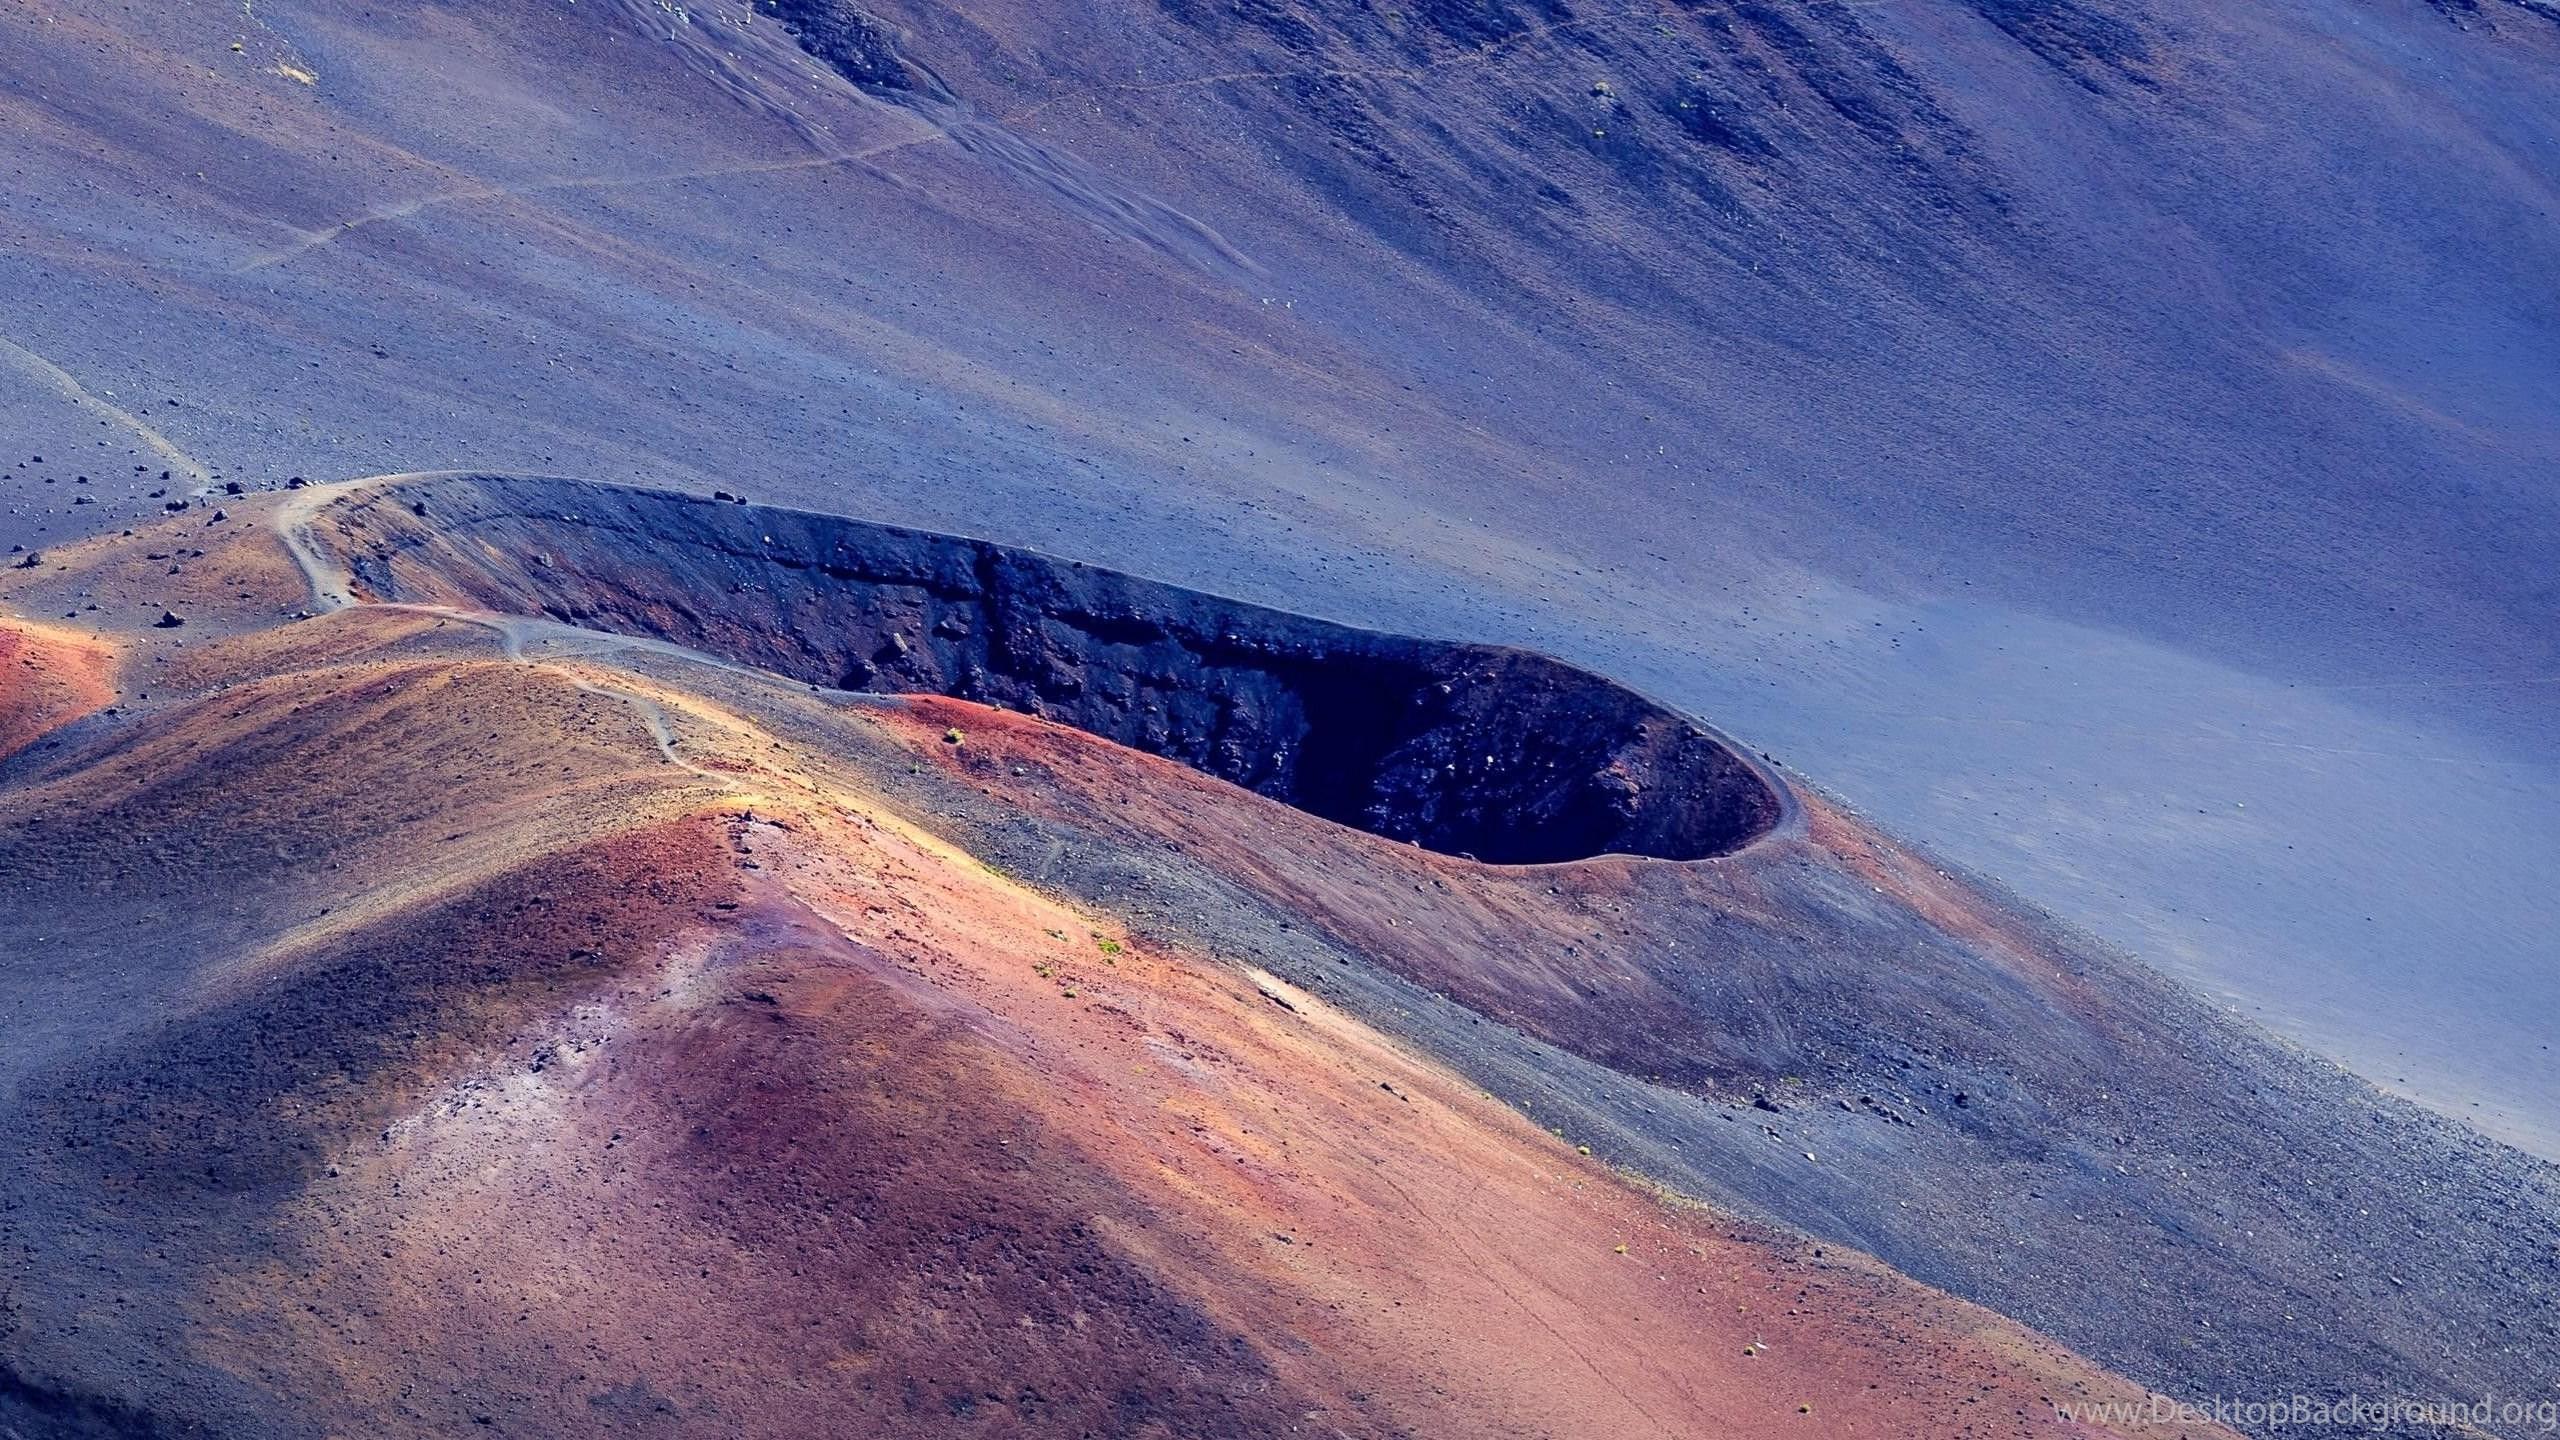 Ultrawide Landscape Nature Photography Wallpapers HD Desktop